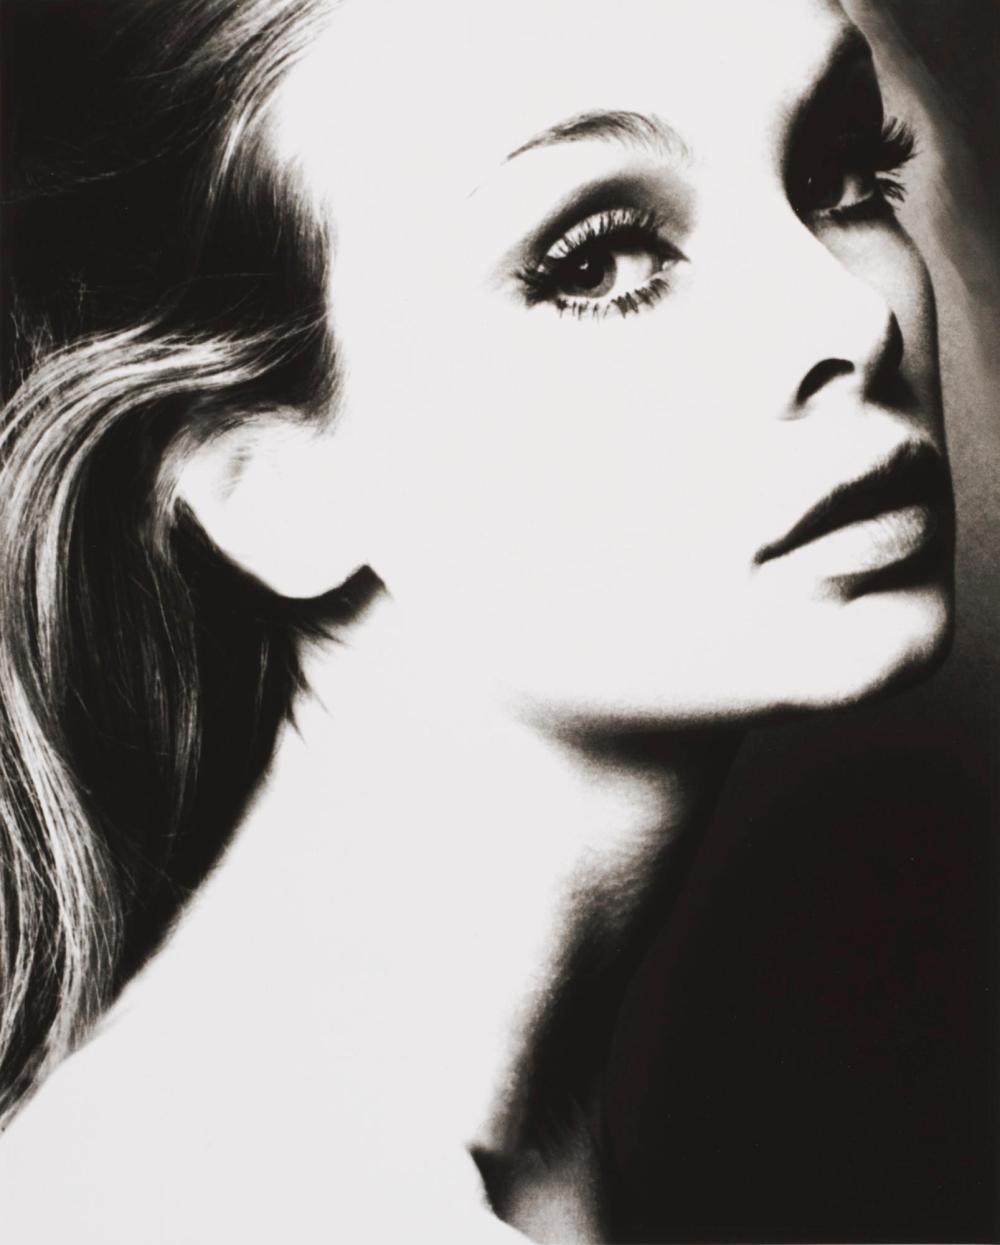 LILLIAN BASSMAN | Jean Shrimpton, ca. 1955